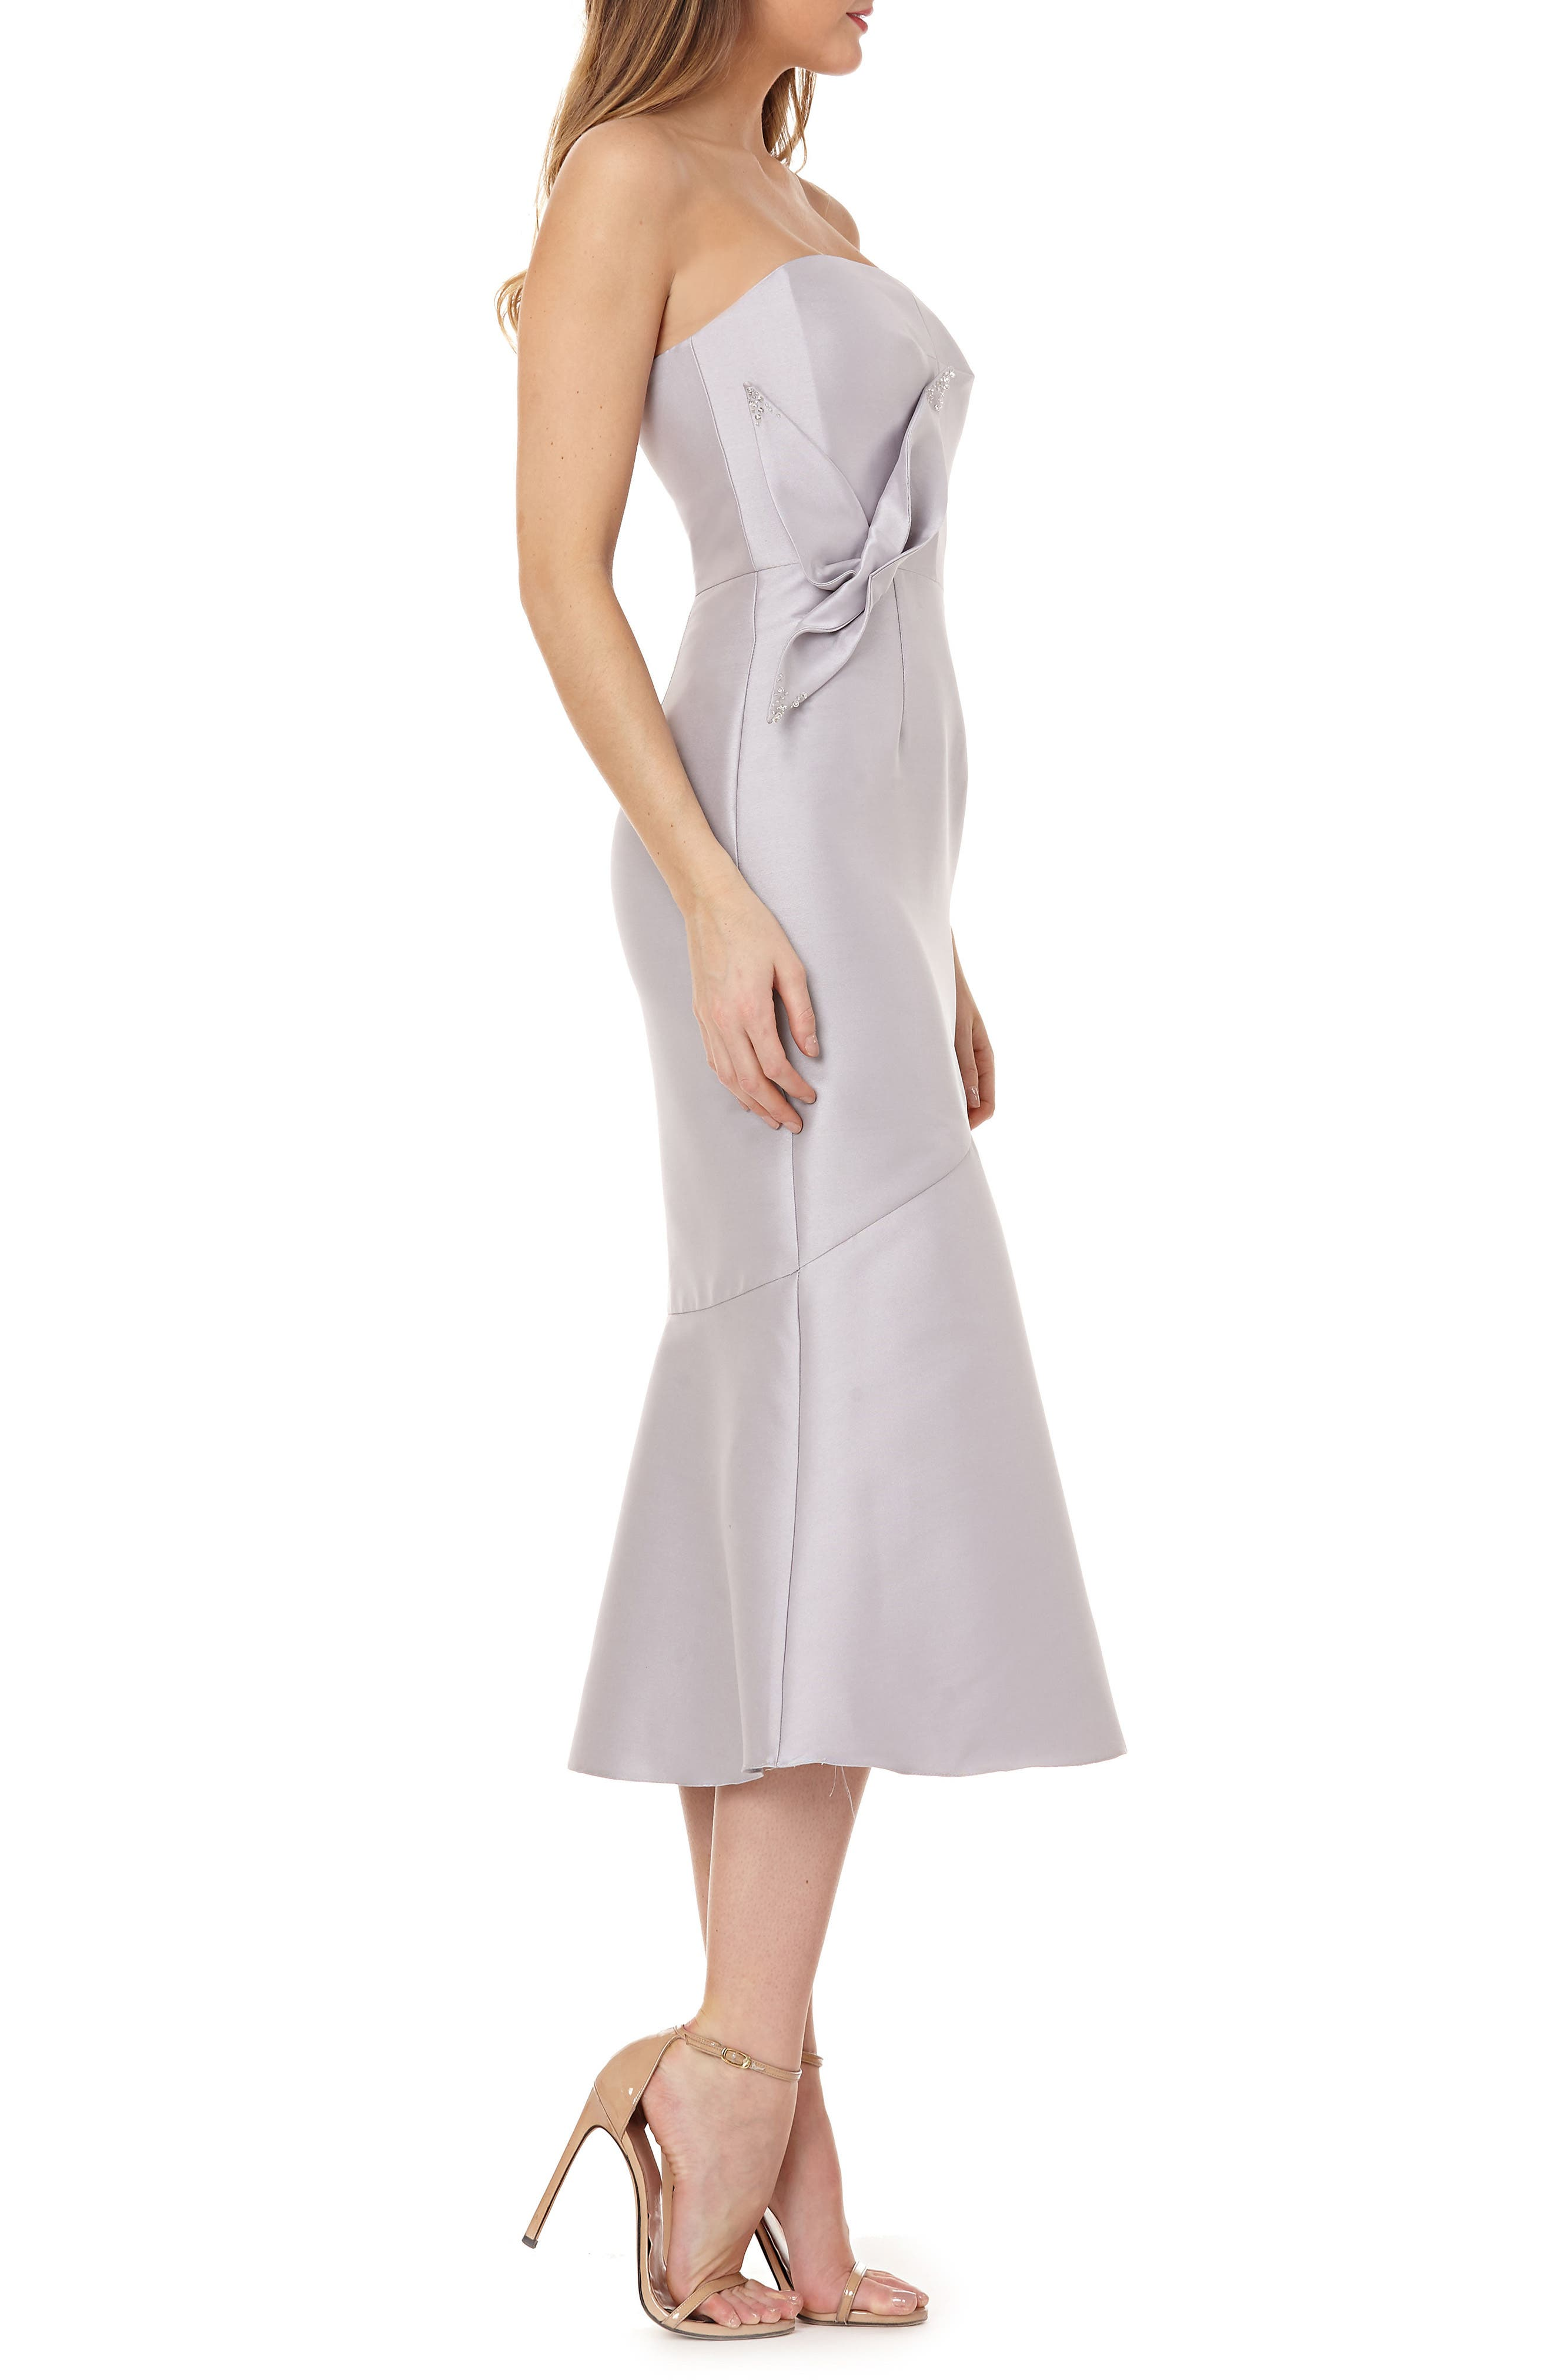 Strapless Satin Tea Length Dress,                             Alternate thumbnail 3, color,                             Dove Grey